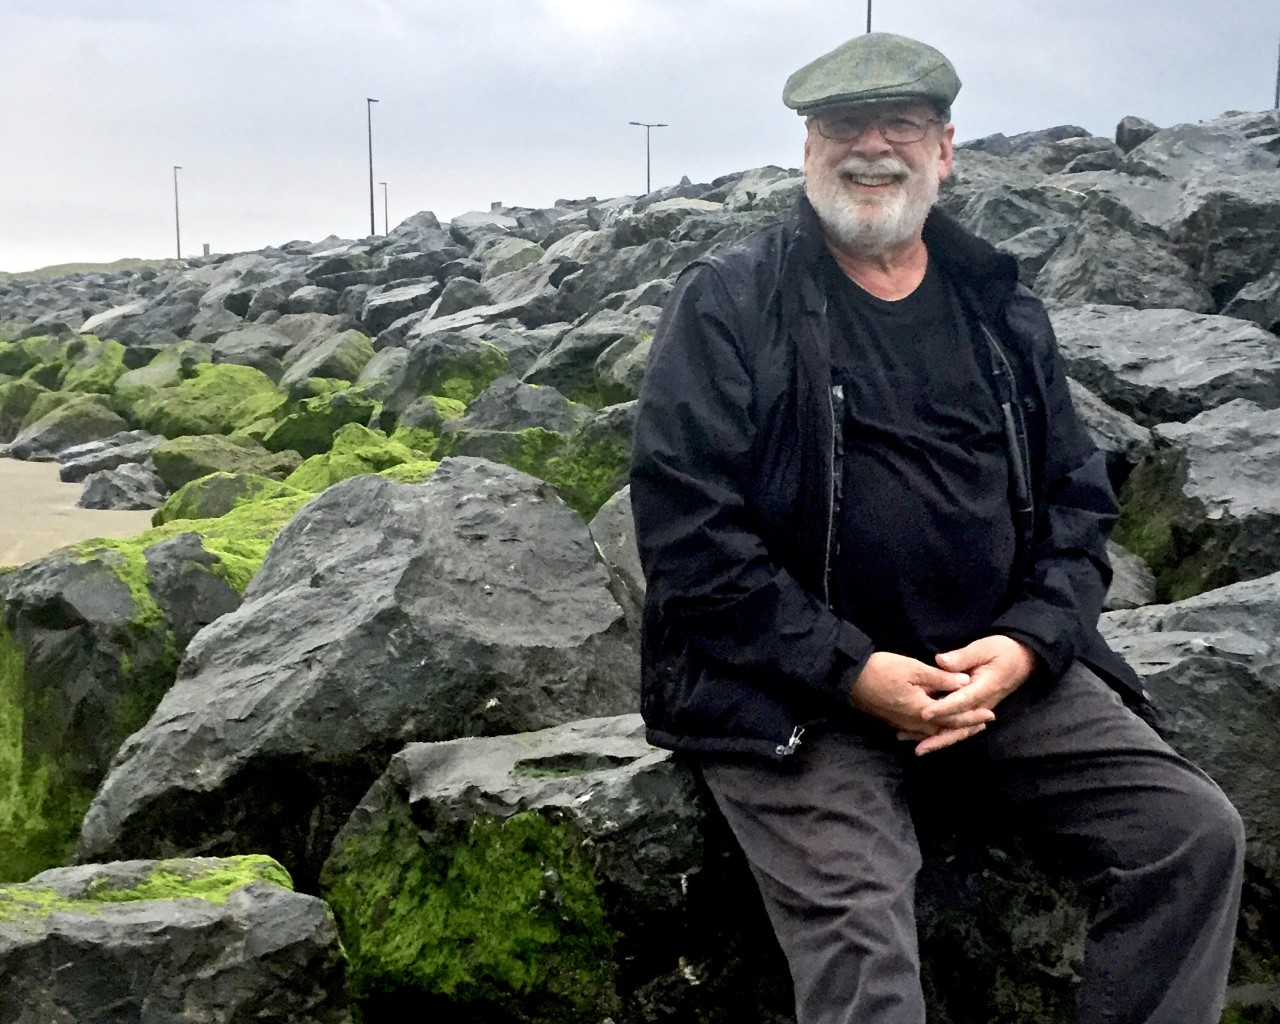 Stephen Leigh sitting on rocks in Ireland.